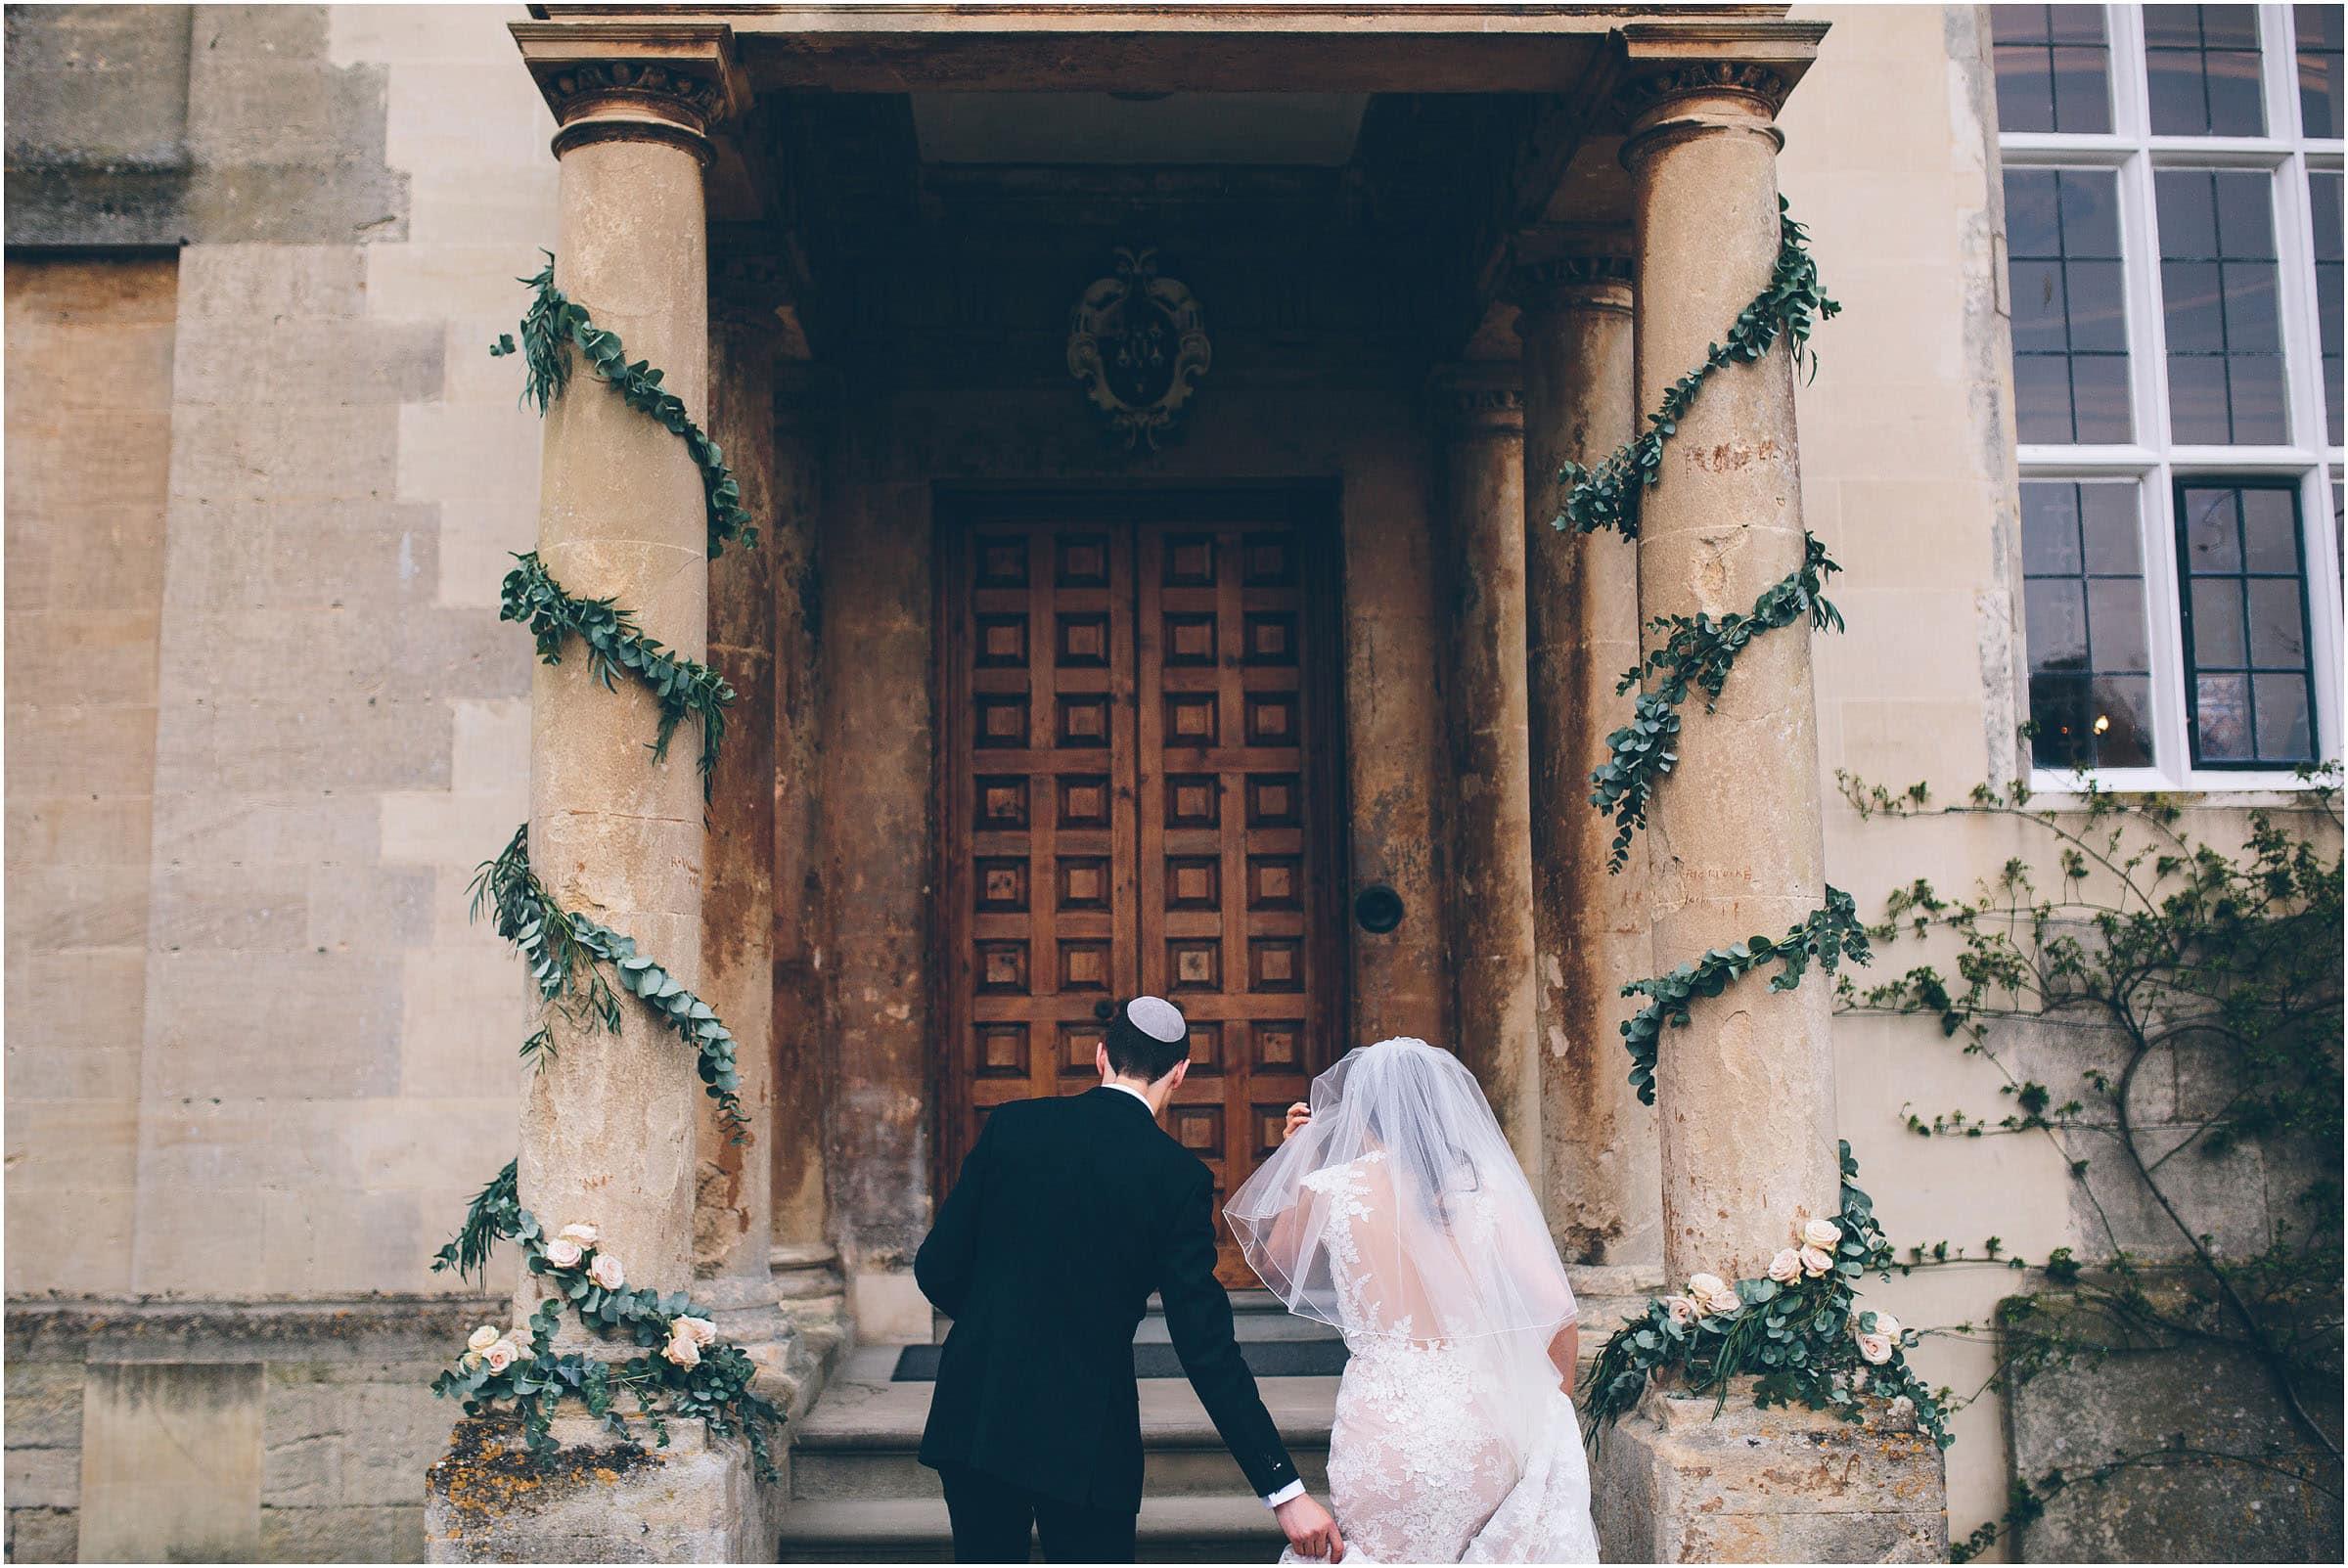 Elmore_Court_Wedding_Photography_0070